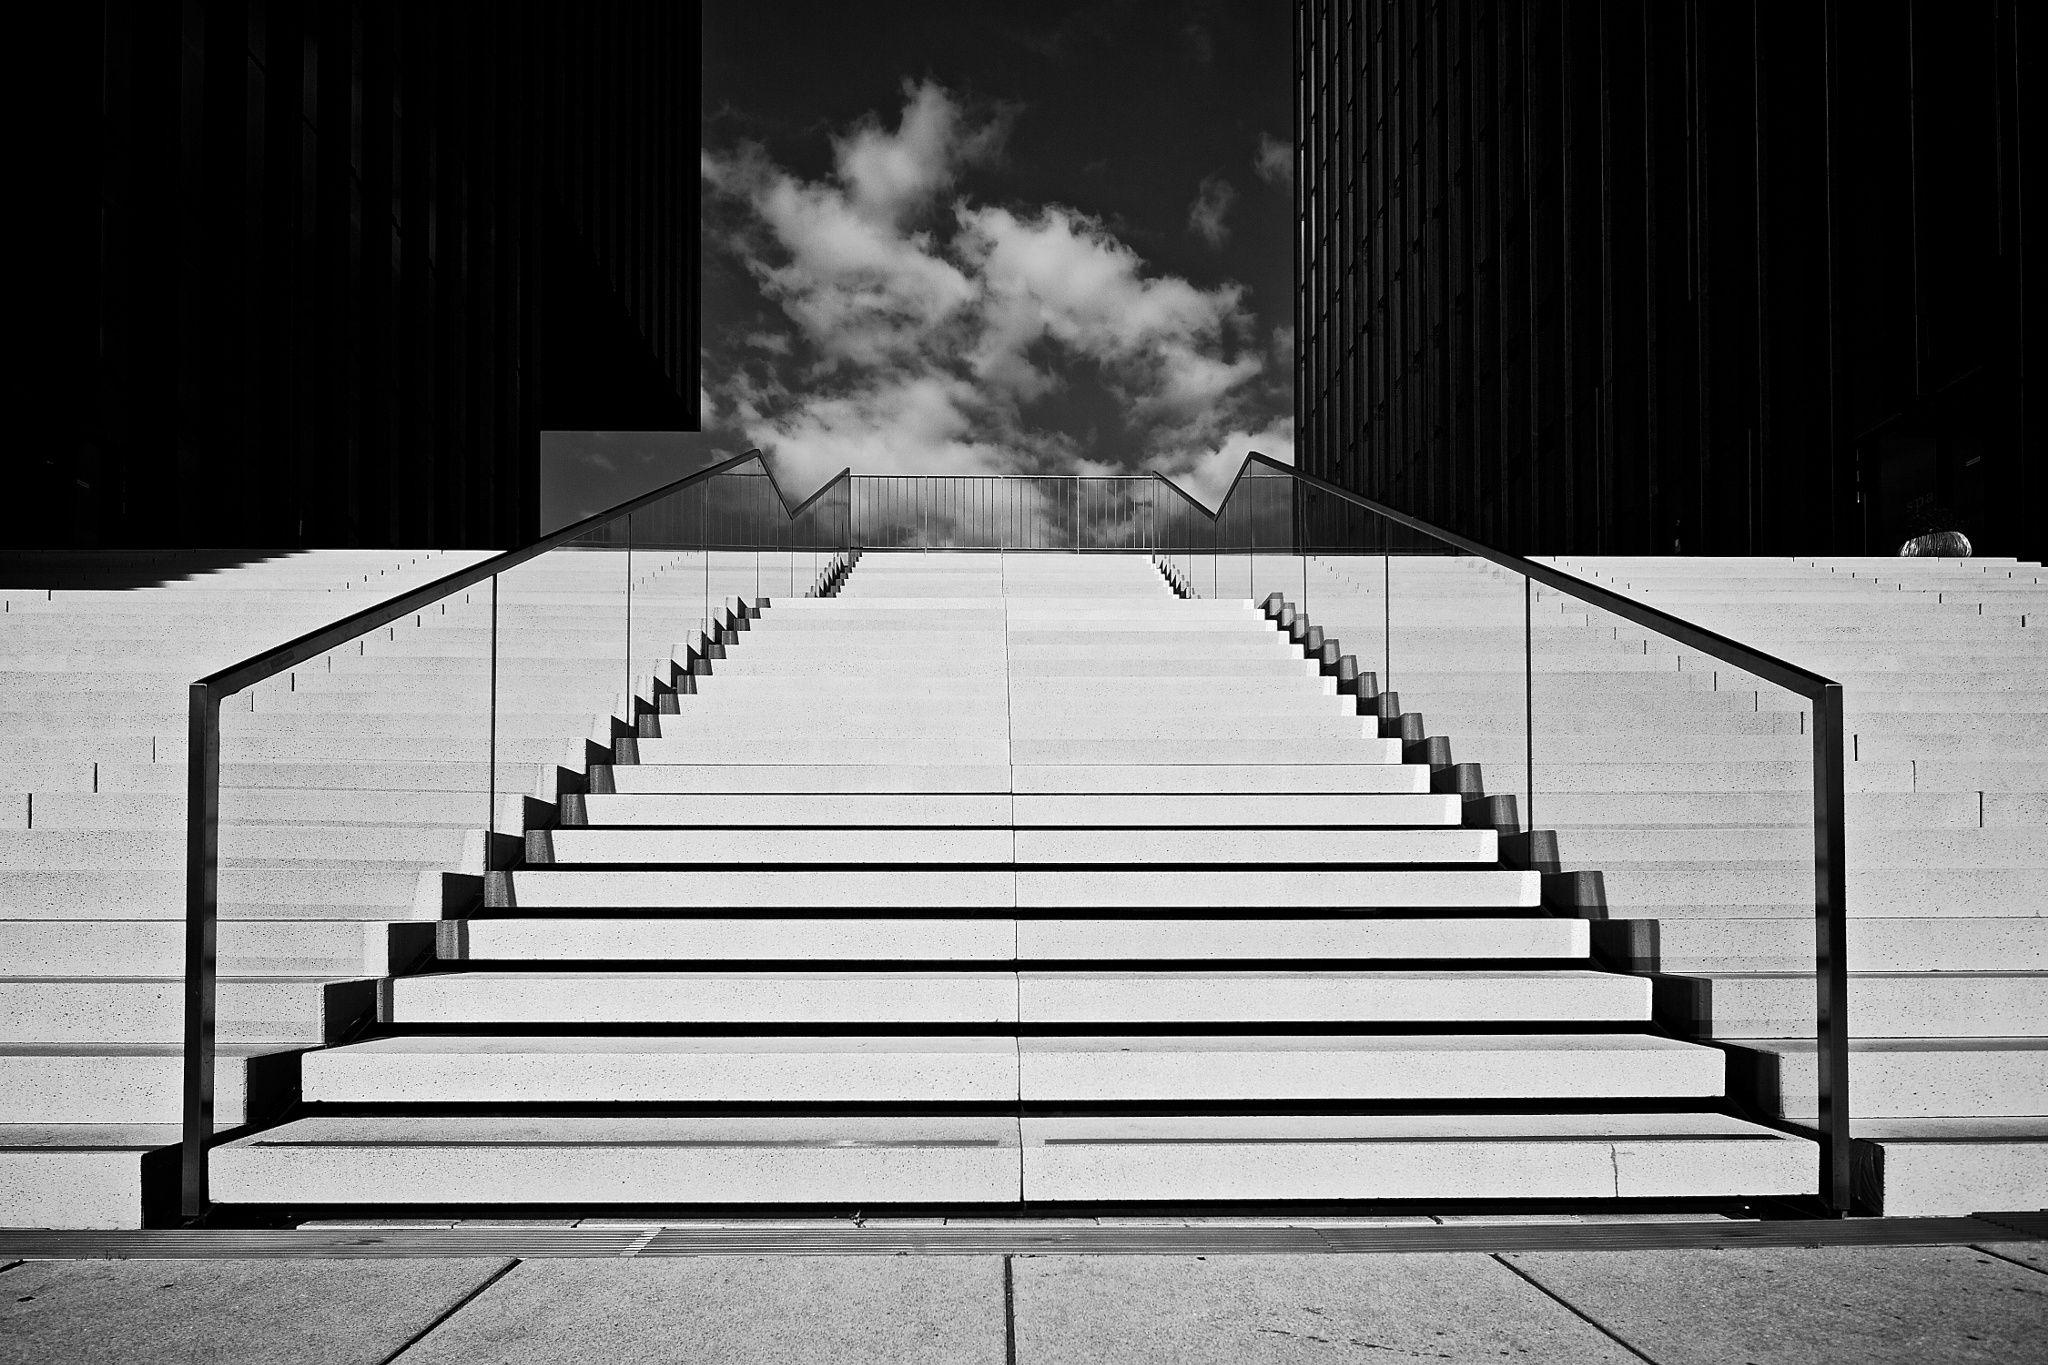 Etagenbett Heaven : Stairway to heaven by max van son on 500px fb3 pinterest